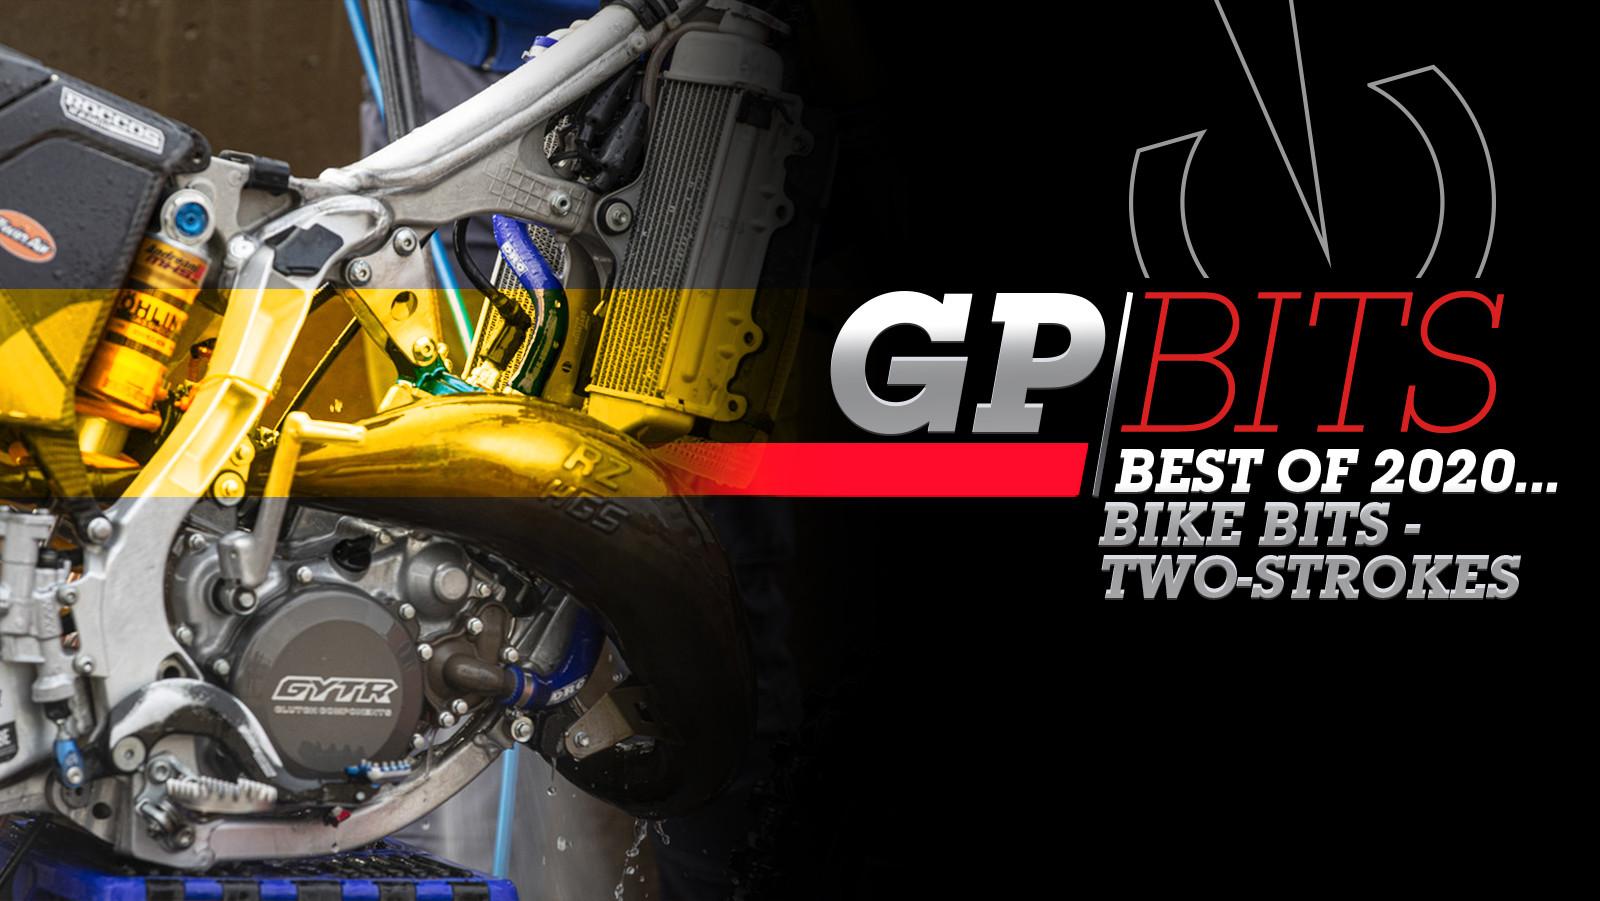 GP Bits: 2020 Best of Bike Bits - Two-Strokes